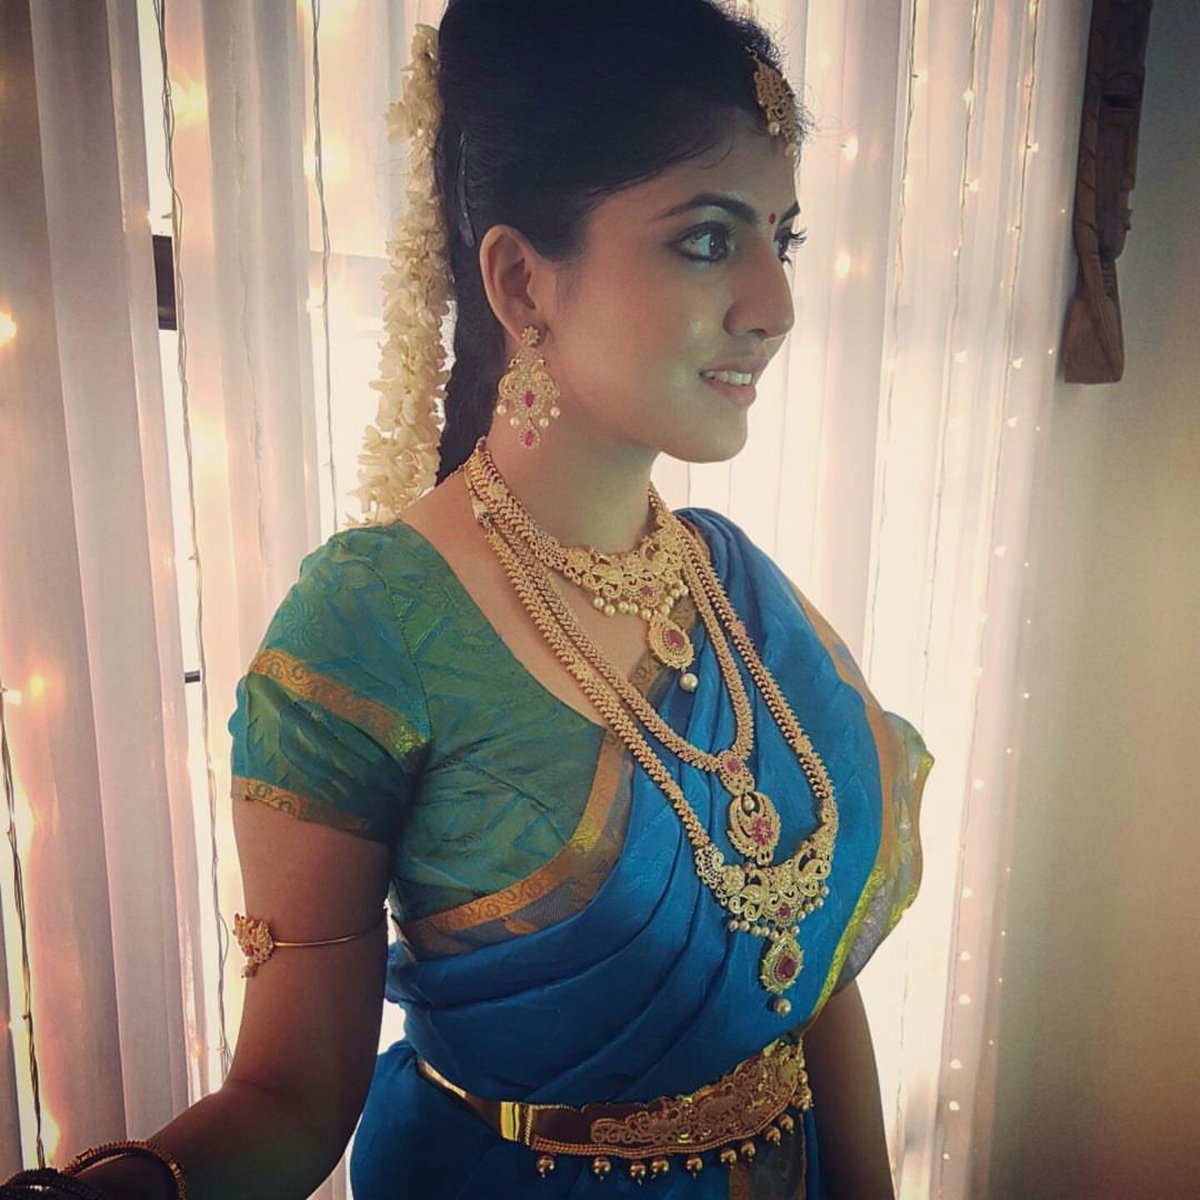 anaswara kumar hot navel